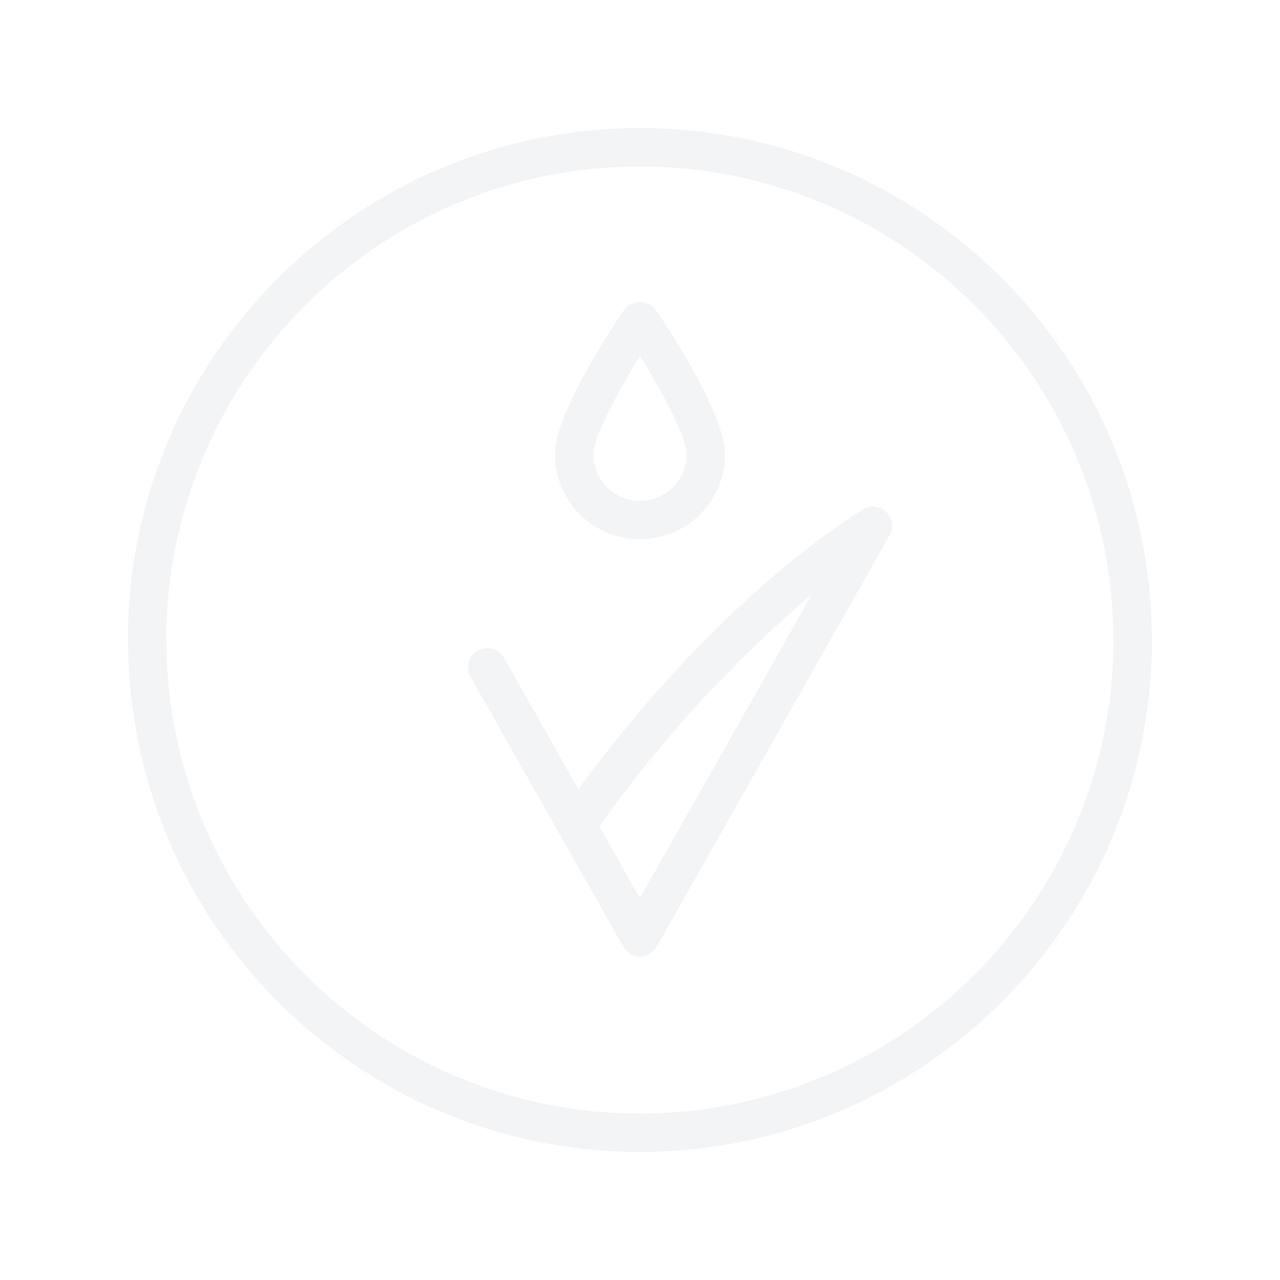 COLLISTAR Cleansing Foam-Cream 150ml